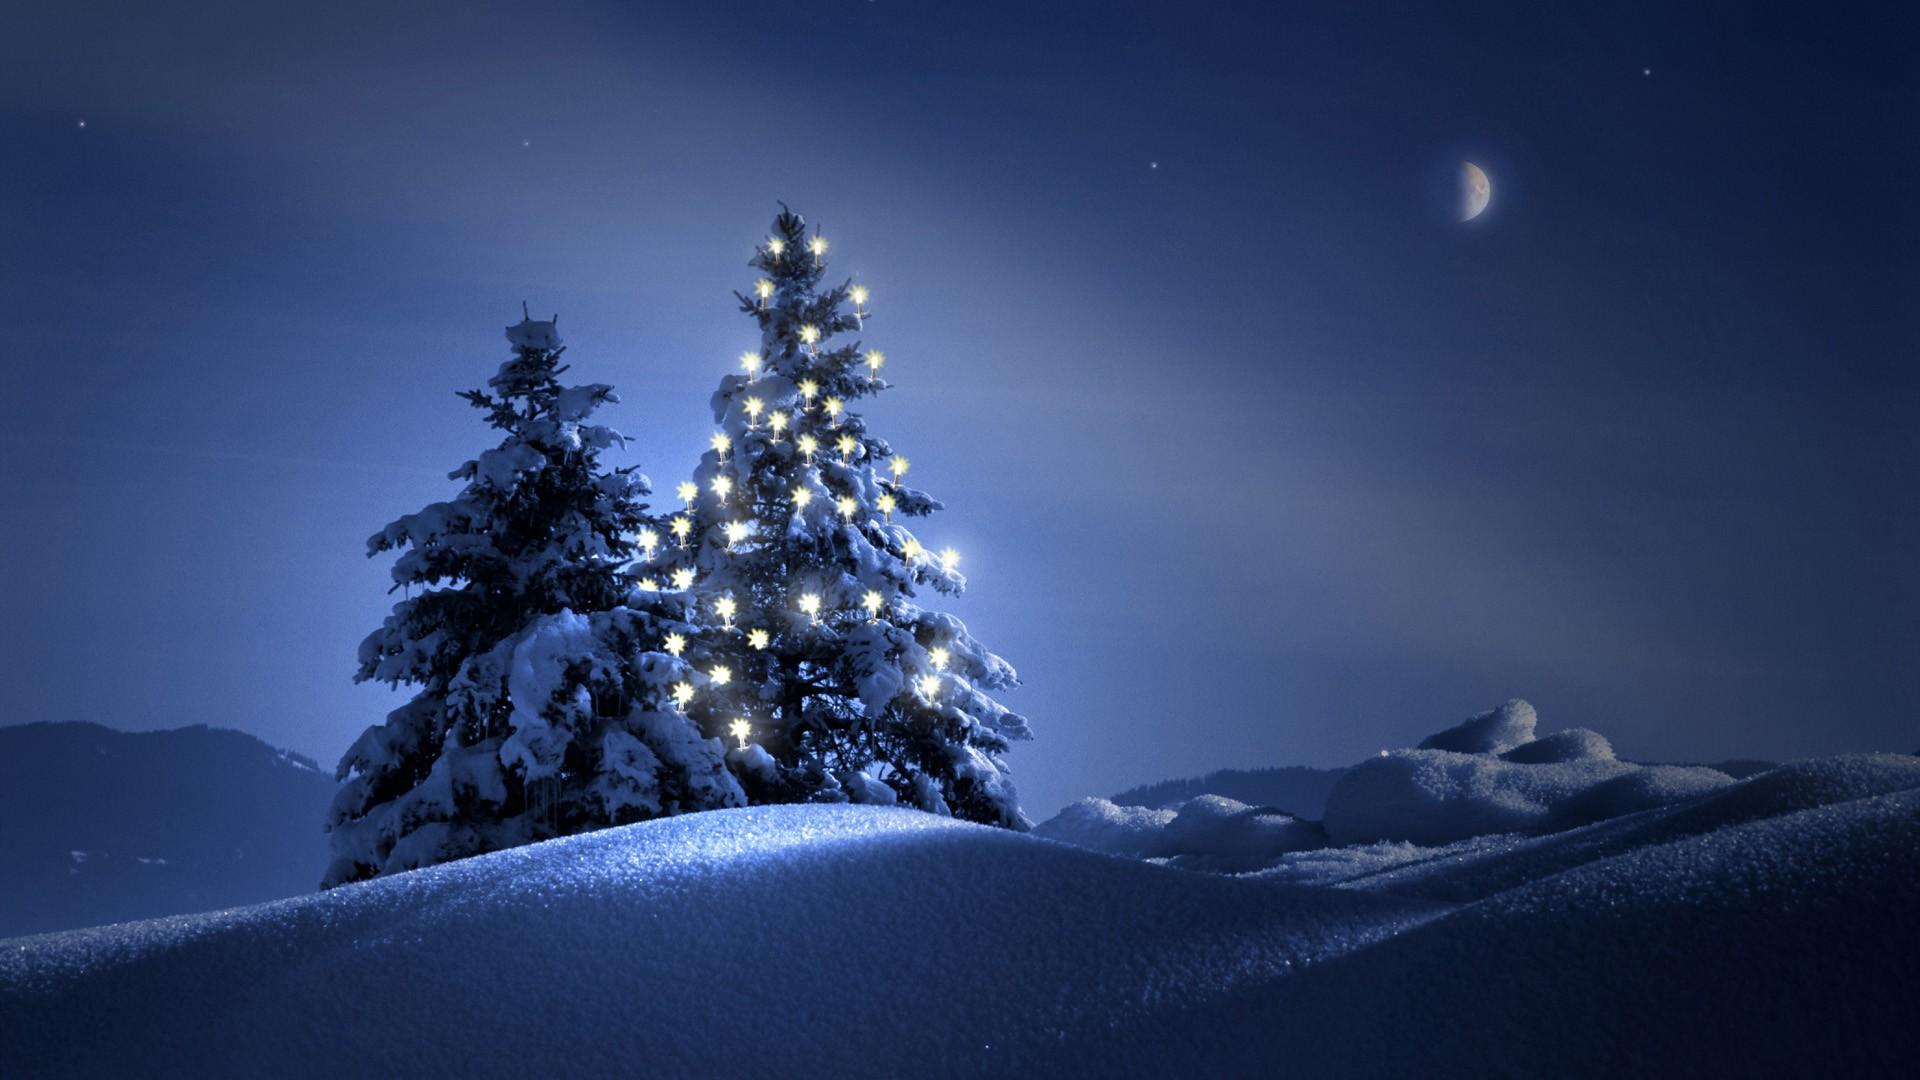 christmas-tree-on-snow-wallpaper-wide